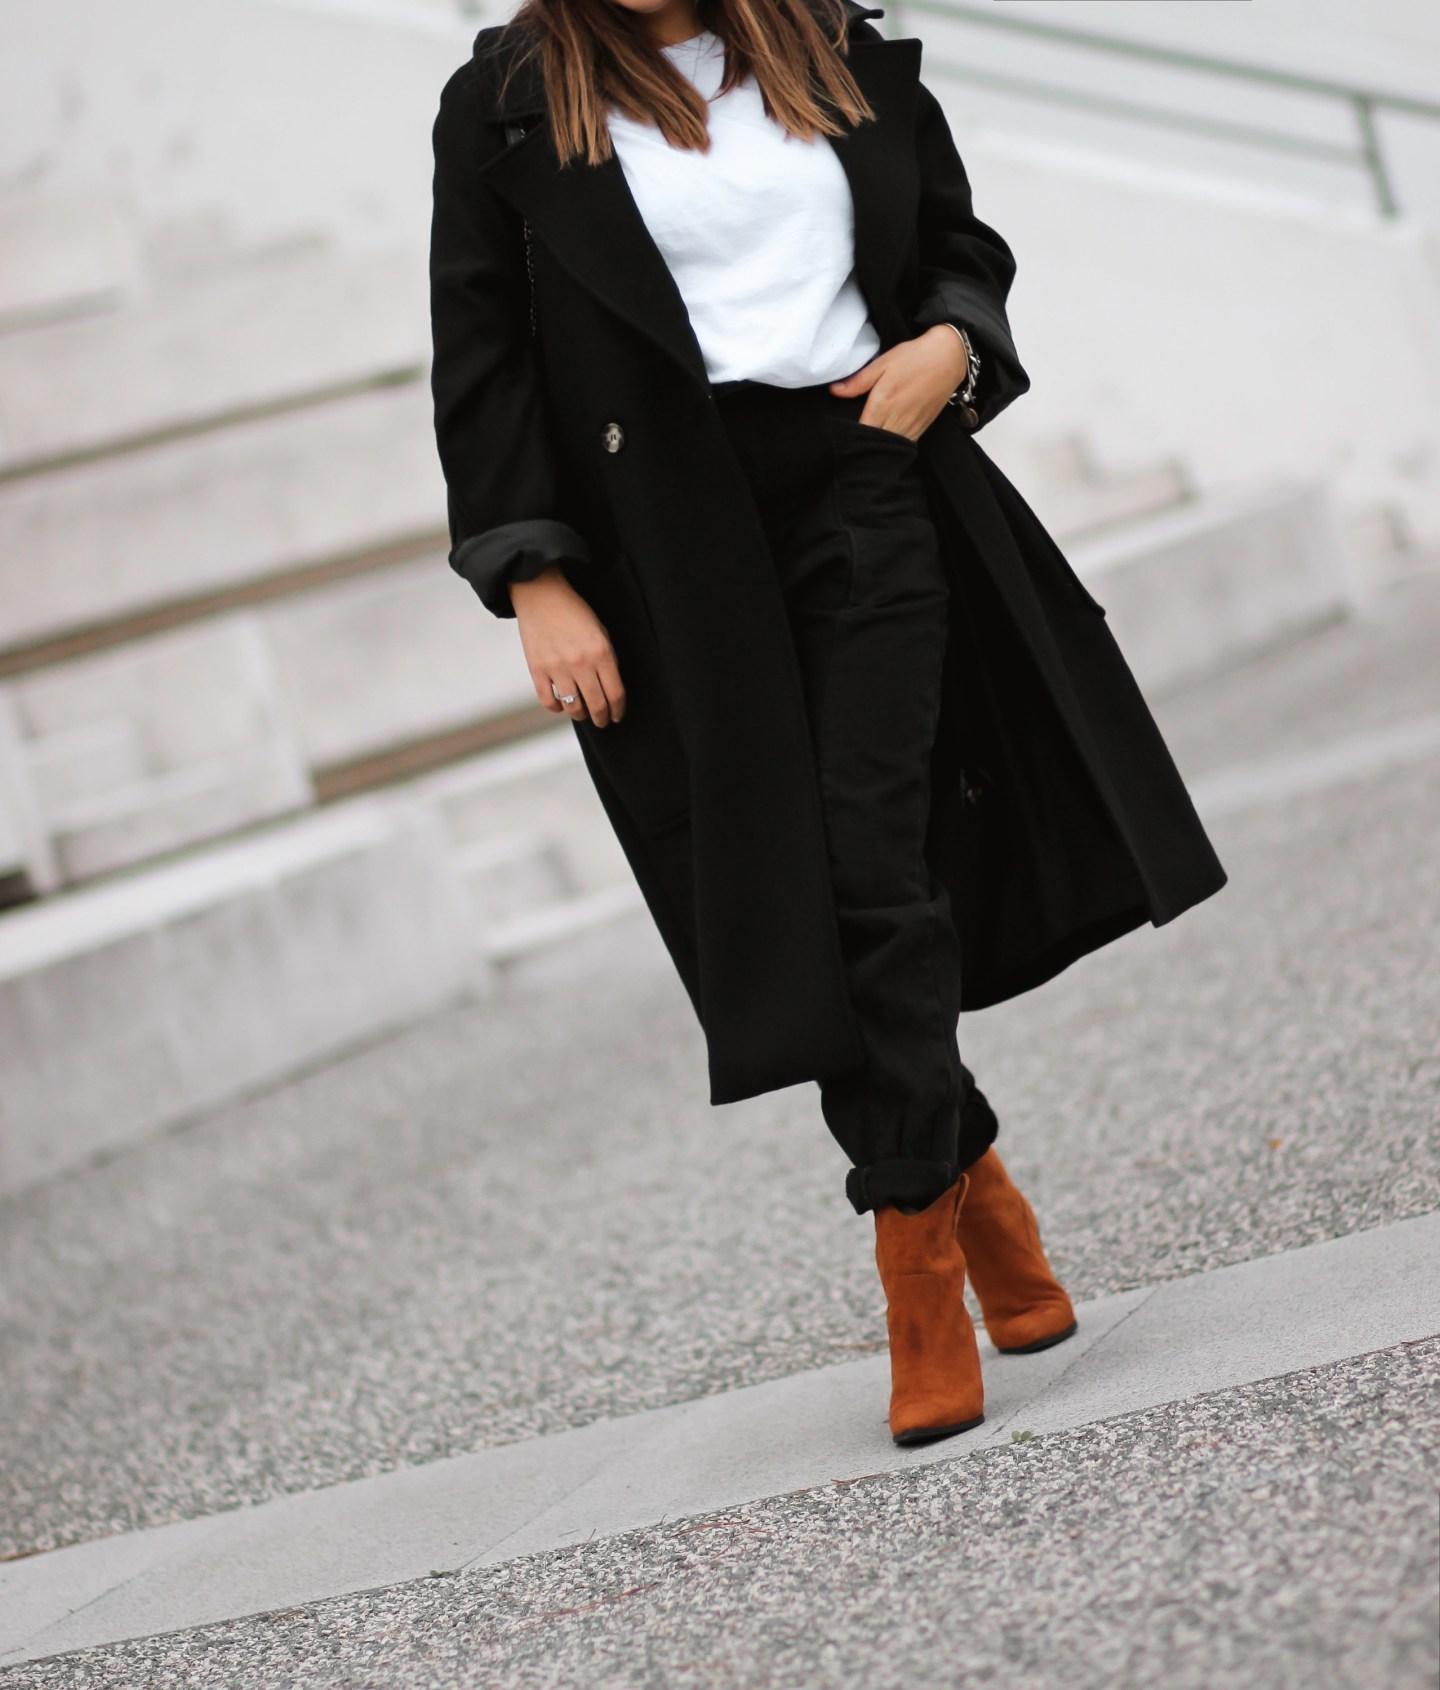 MANTEAU NOIR LOOSE + BAGGY +BOTTINES H&M INSPI #ISABELMARANT !